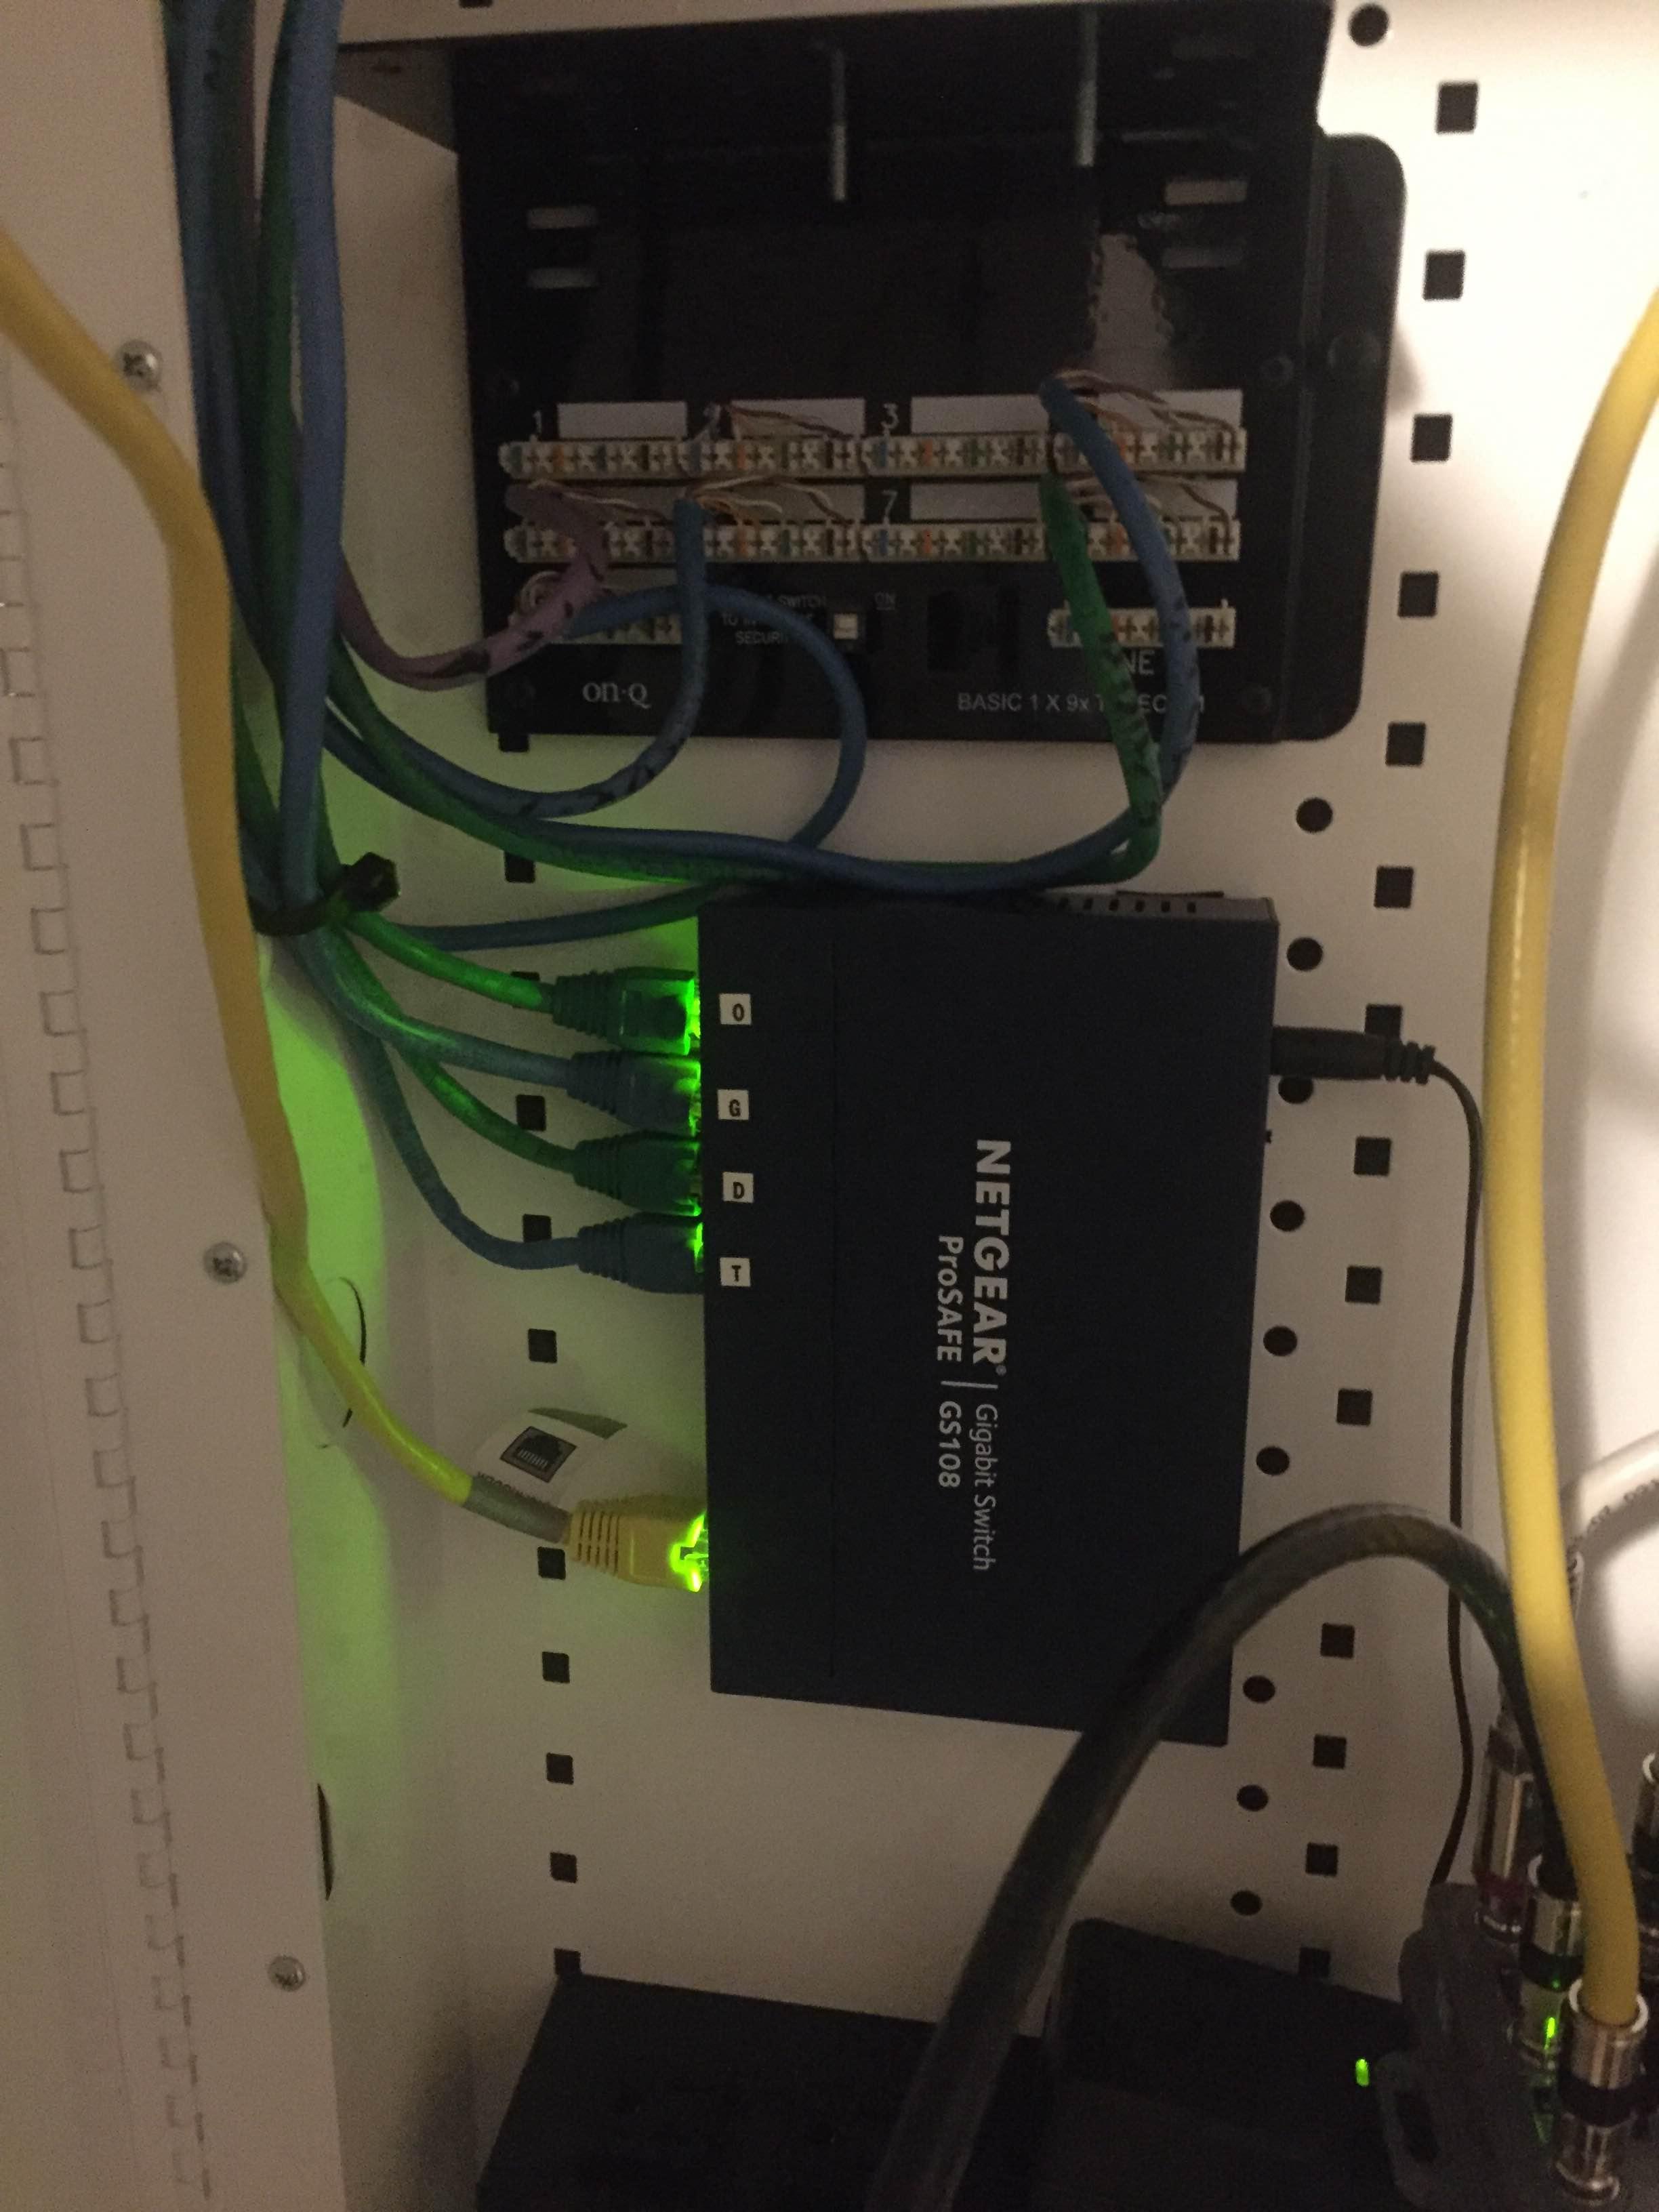 Re Large Home Network Netgear Communities Basic Wiring Onq Panel R8500 Img 3263